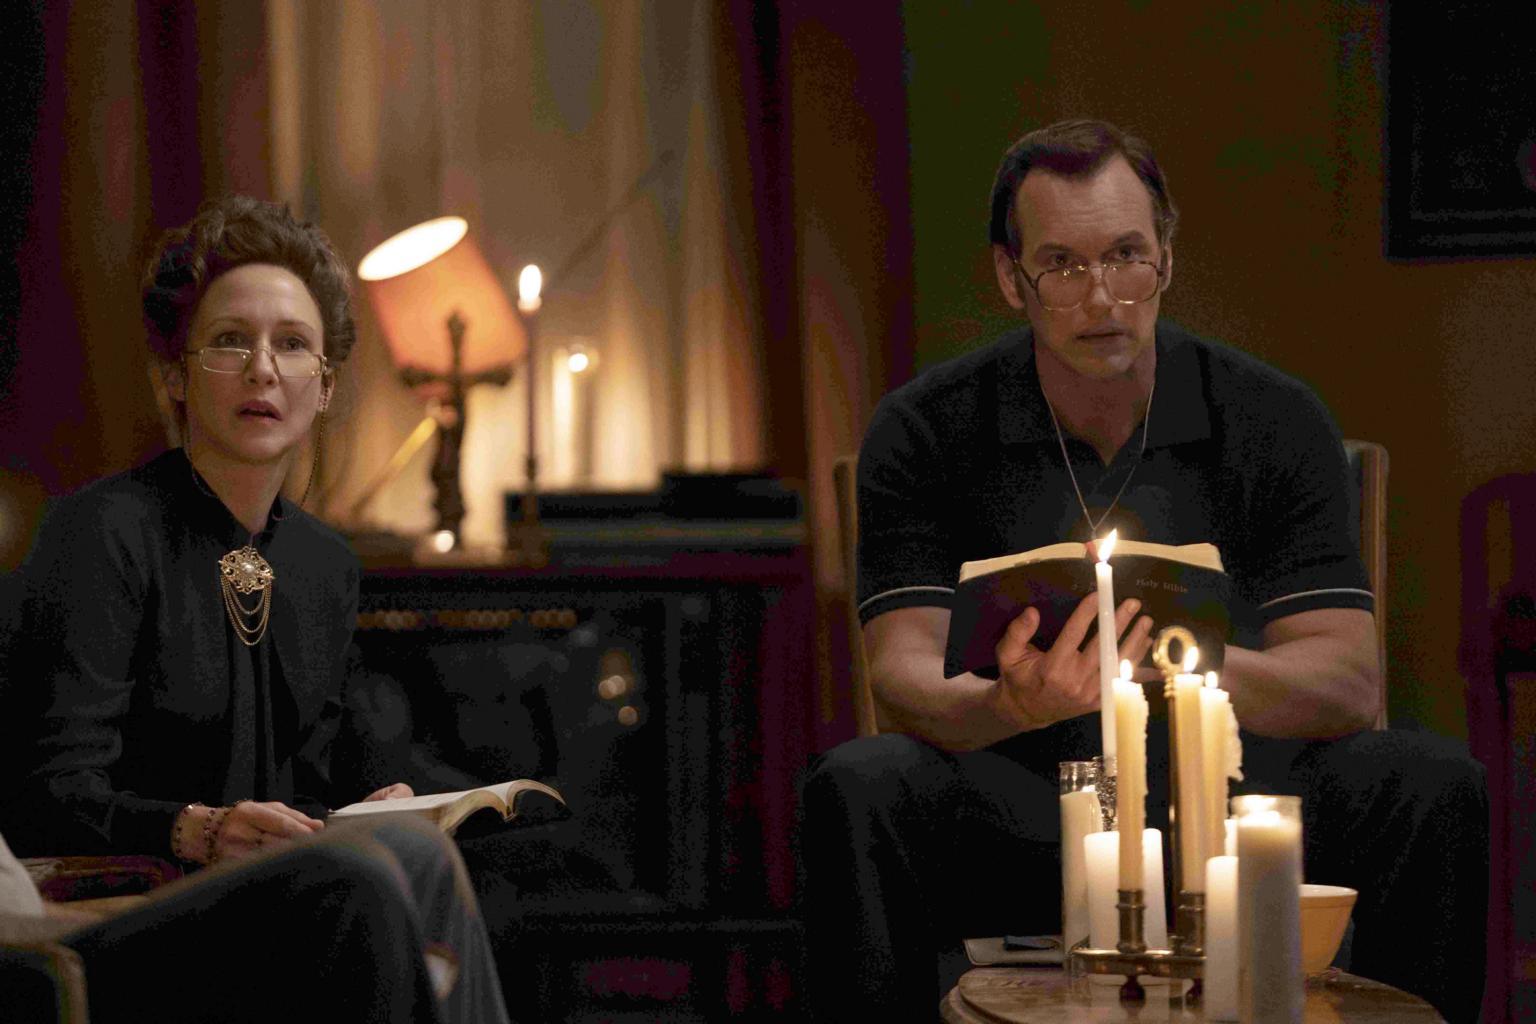 Love directs conjuration movies, says Vera Farmiga